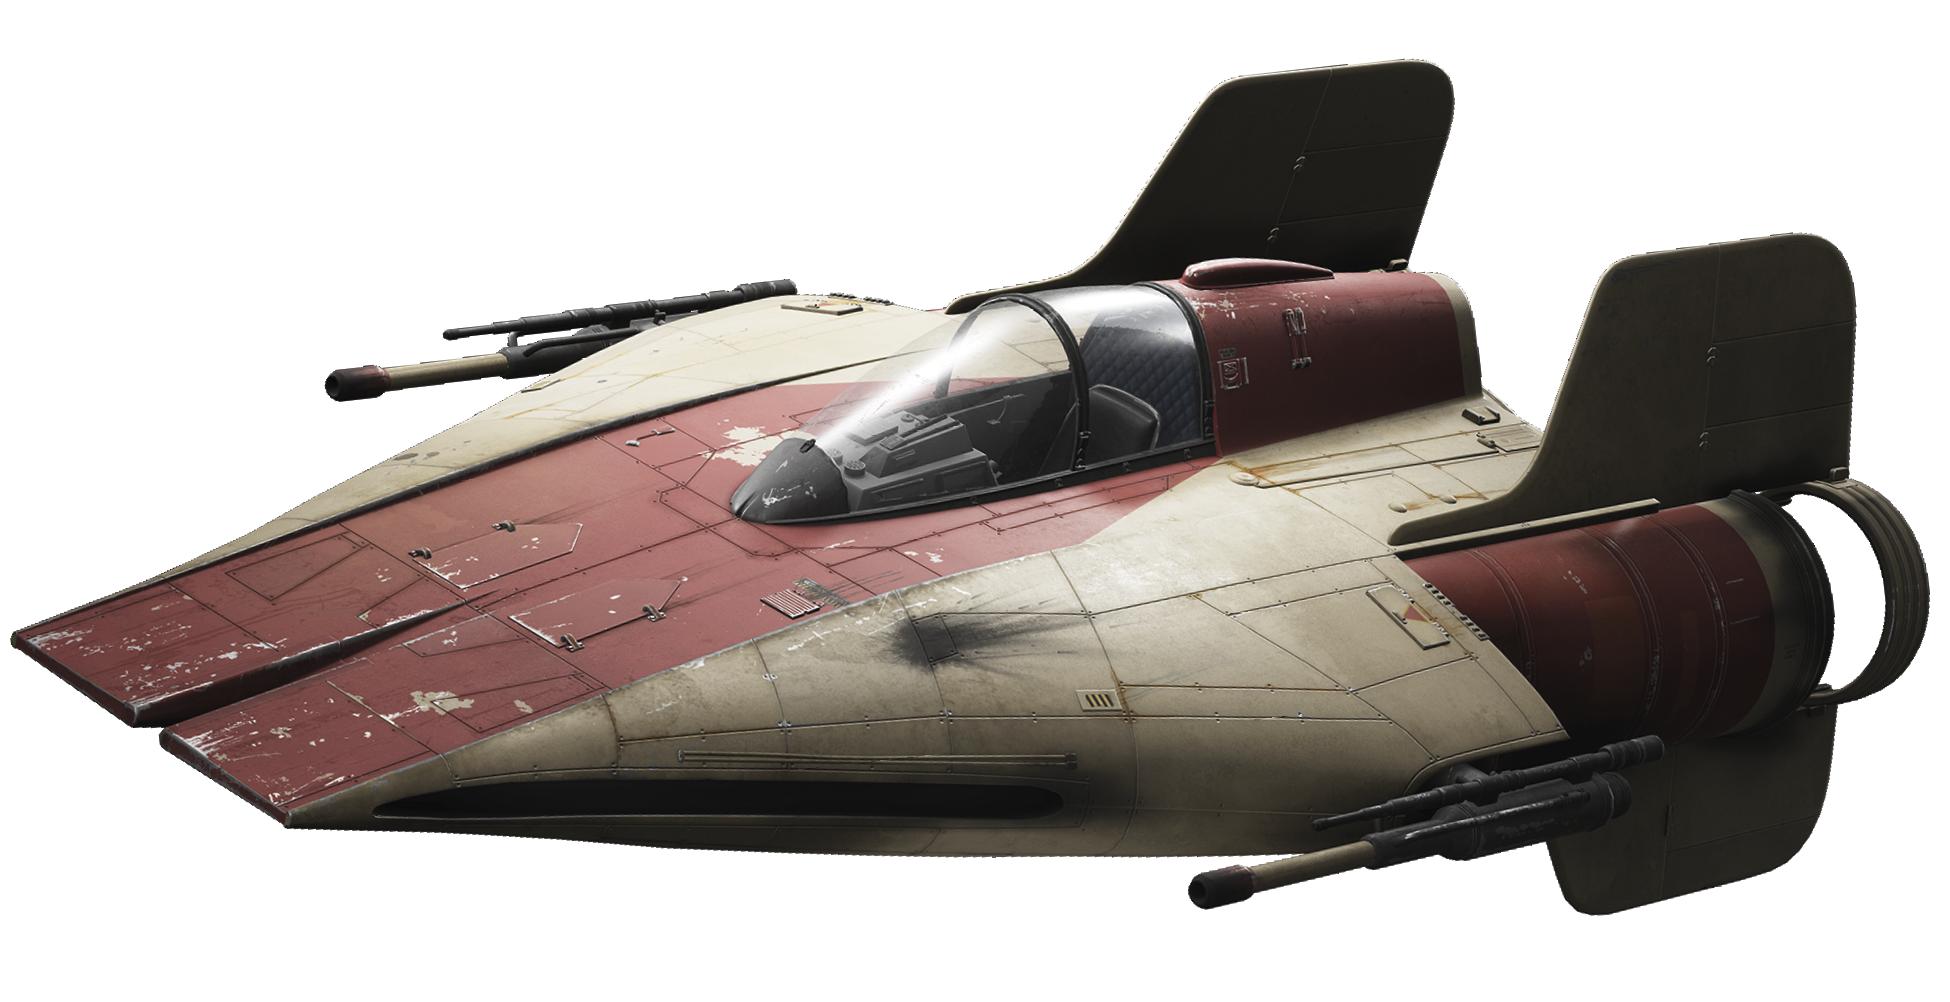 Rz 1 A Wing Interceptor Wookieepedia Fandom